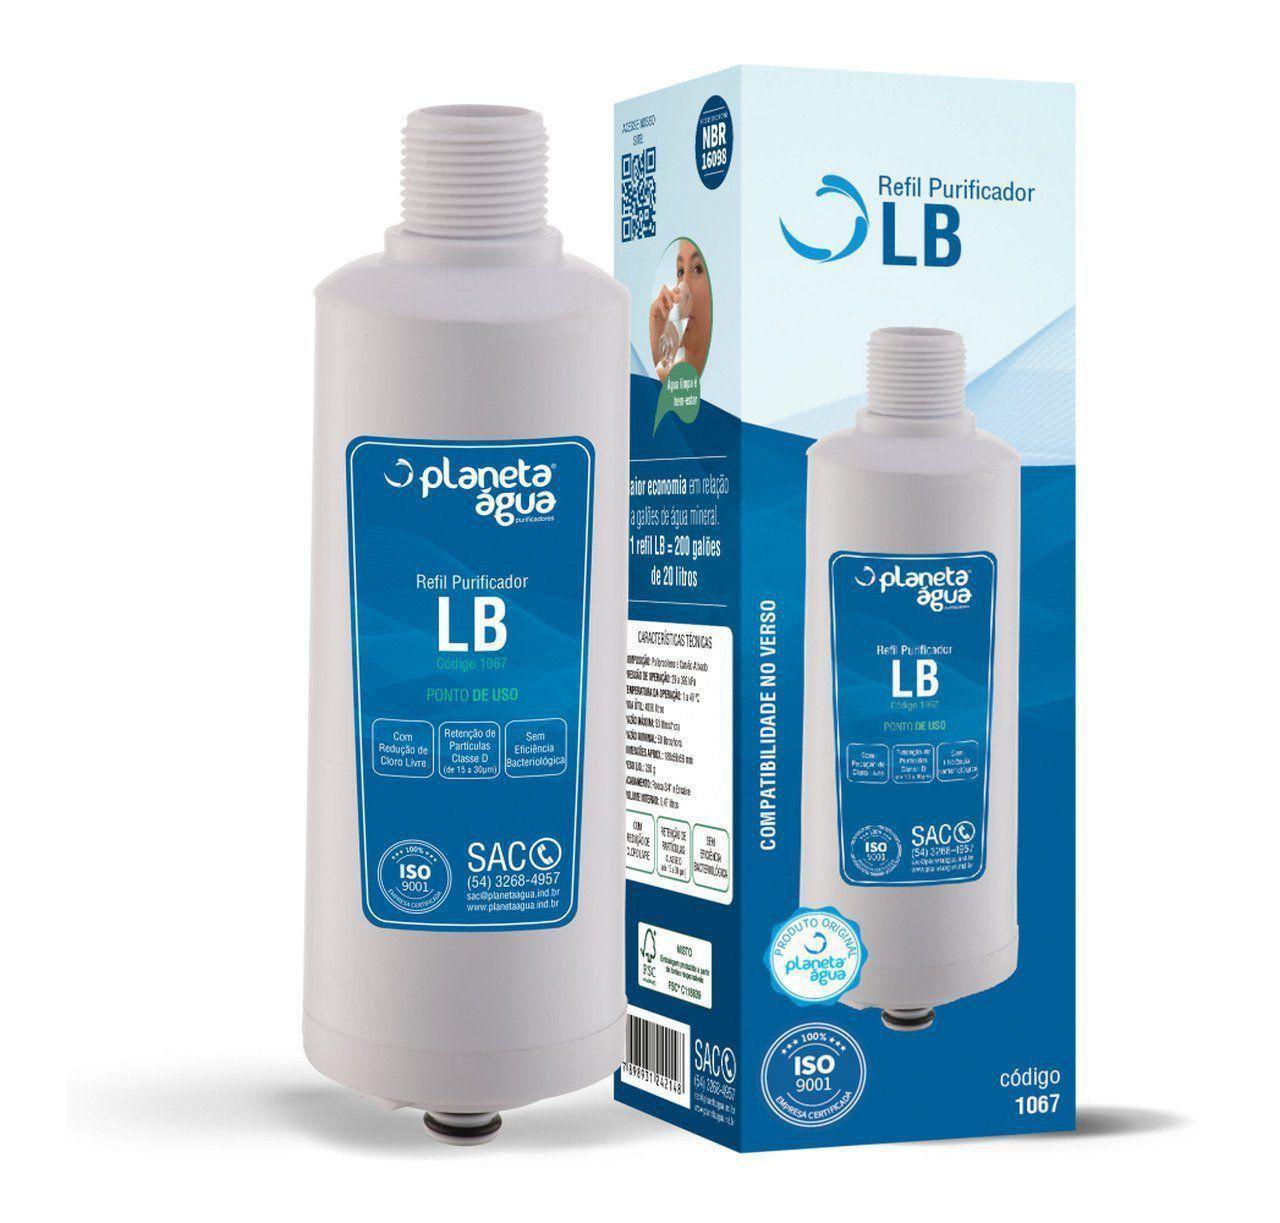 Refil Filtro Planeta Água LB para Purificador de Água Libell Flex - Compatível